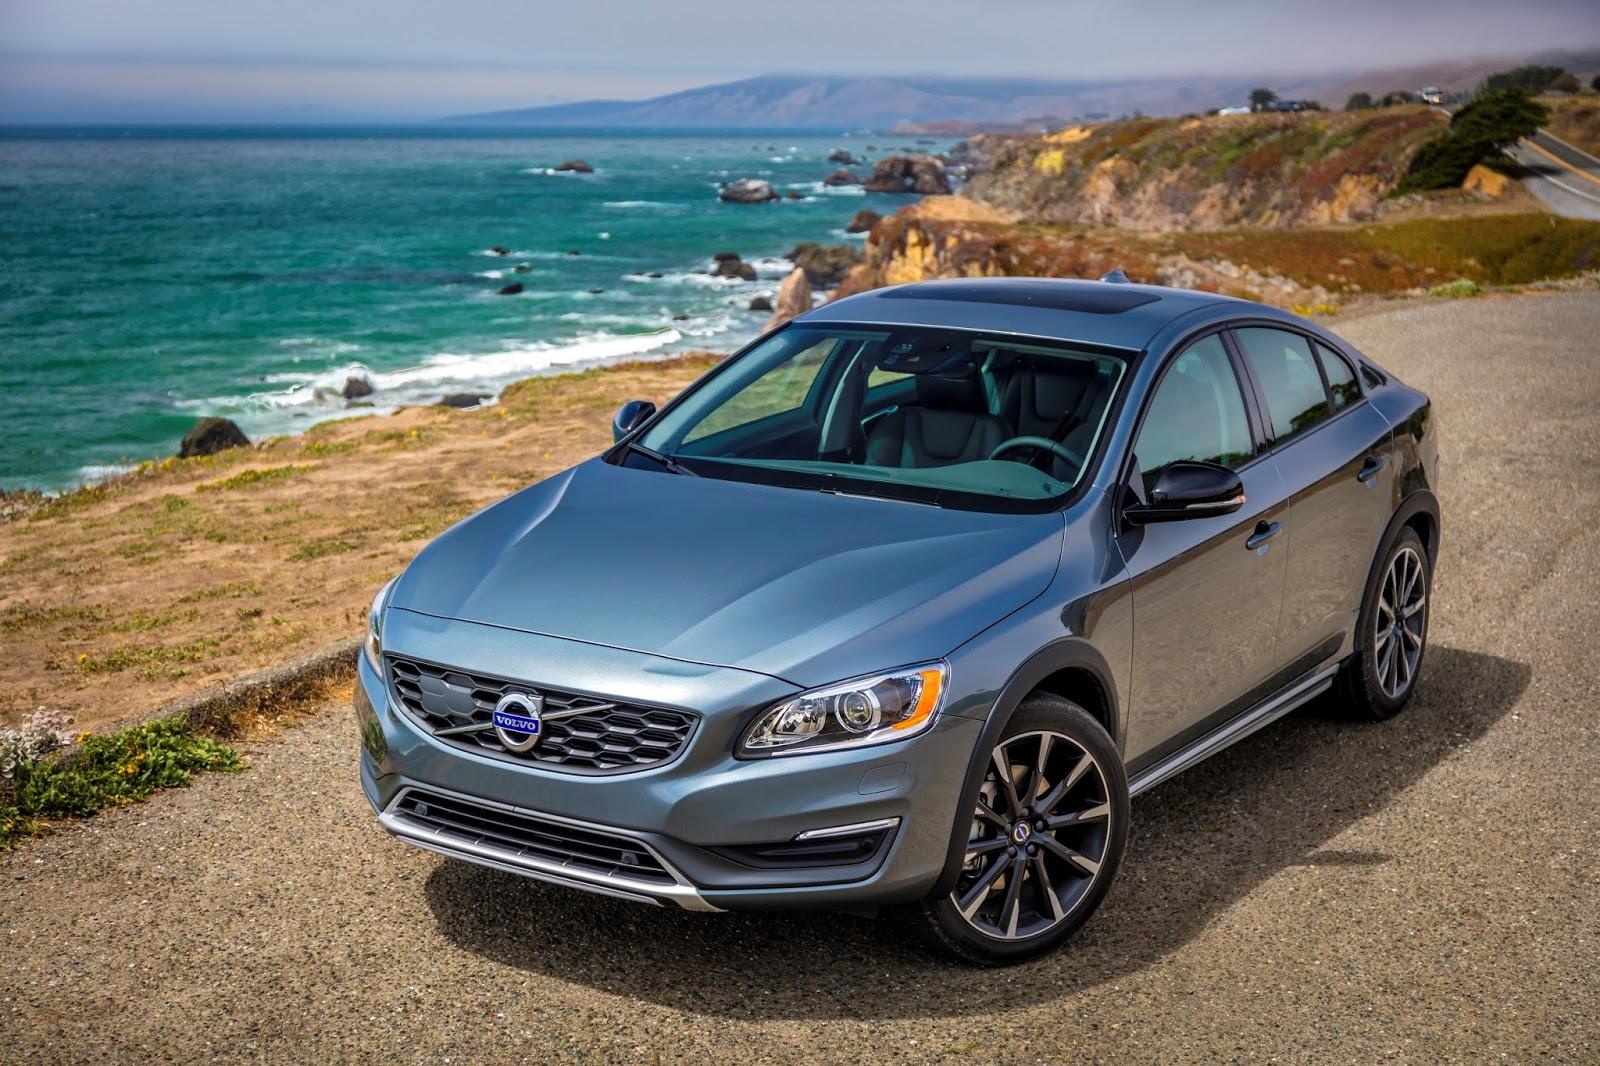 VOLVO%2BS60%2BCROSS%2BCOUNTRY%2B4 Η Volvo με το νέο S60 Cross Country δημιουργεί το πρώτο sedan με διττό χαρακτήρα